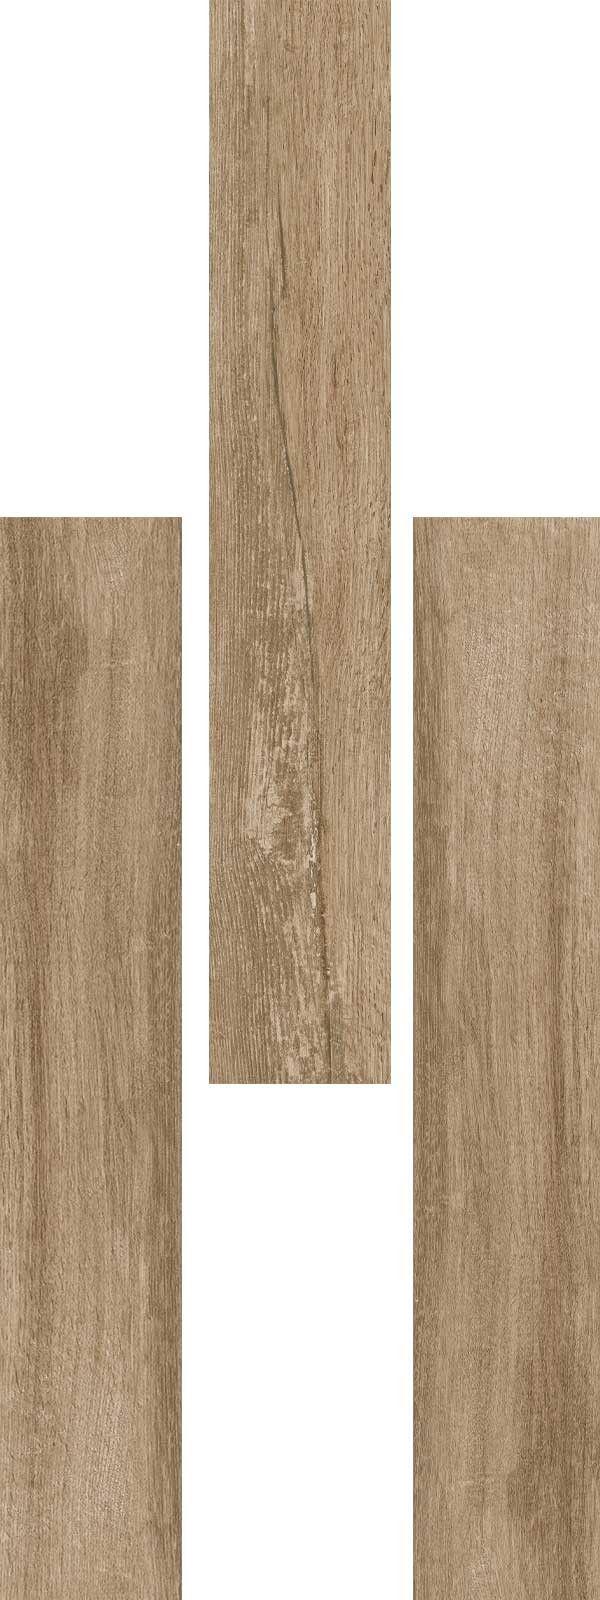 Wood Look Porcelain Tile: 158 Best Images About Tile + Flooring On Pinterest